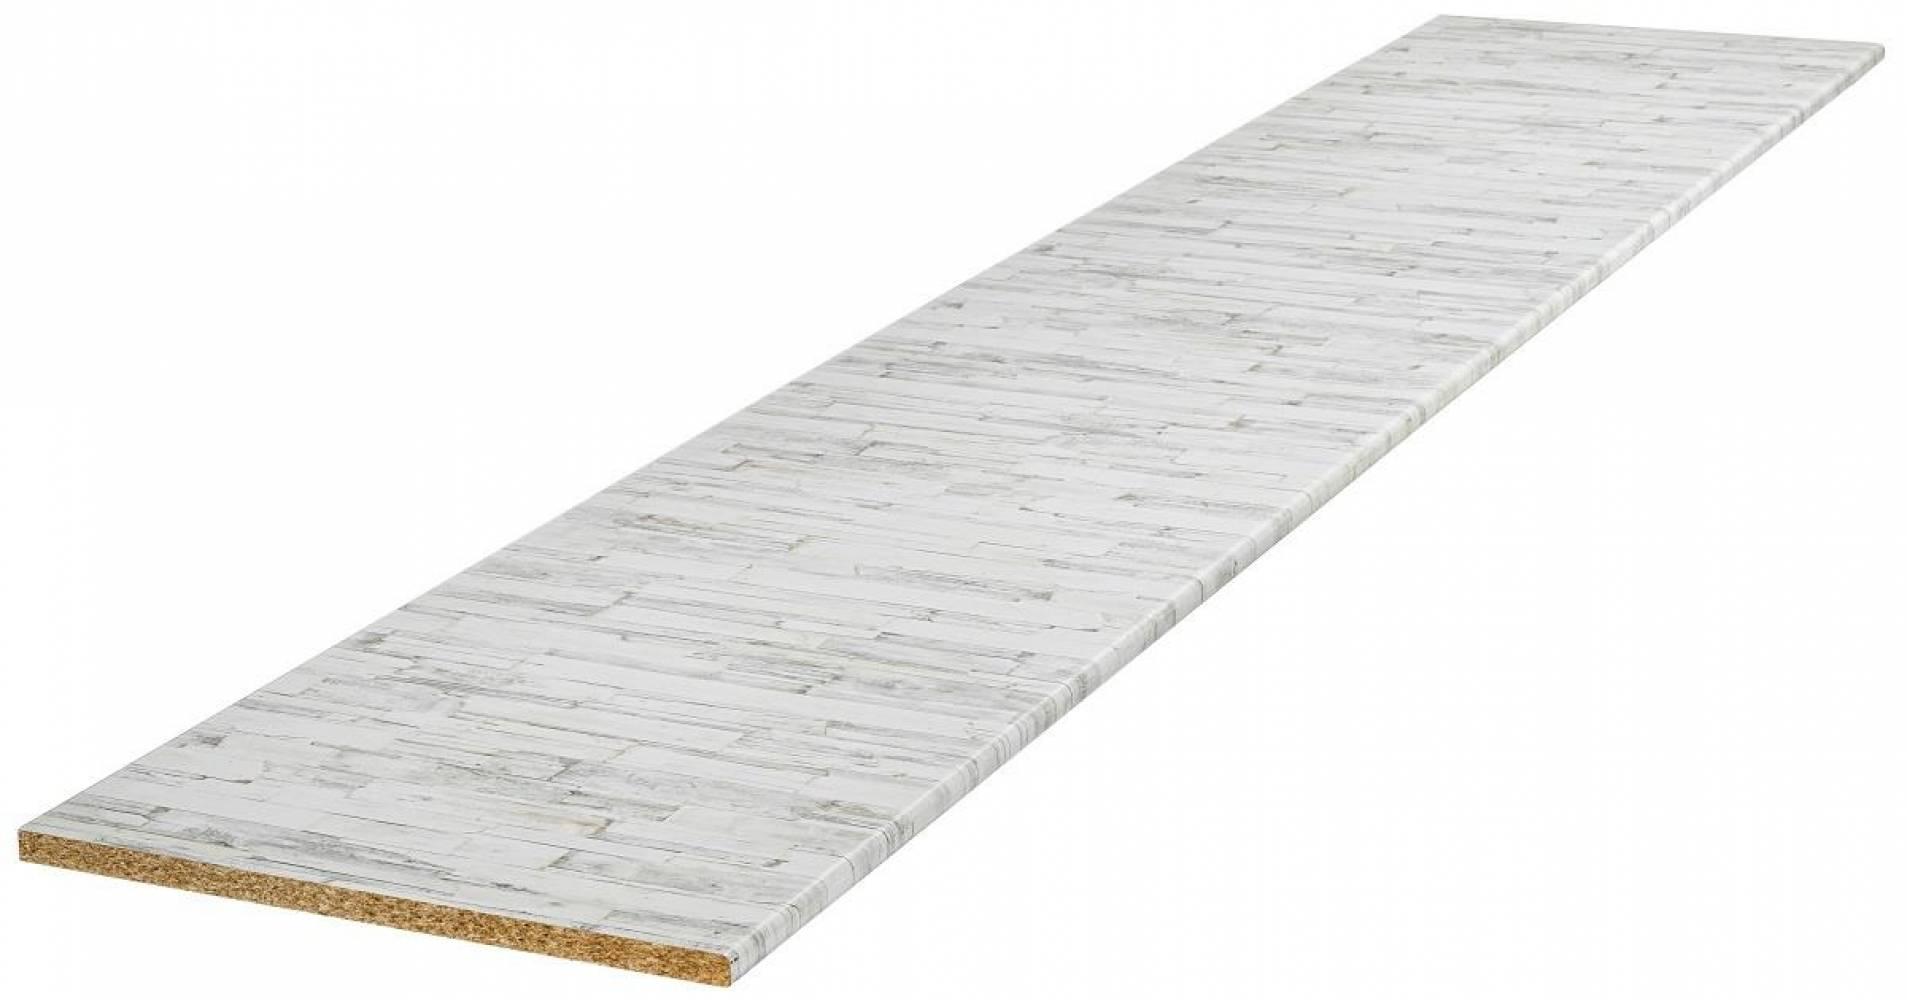 Столешница № 58 Винтажное дерево 26 мм Матовая Скиф, цена  за пог/метр